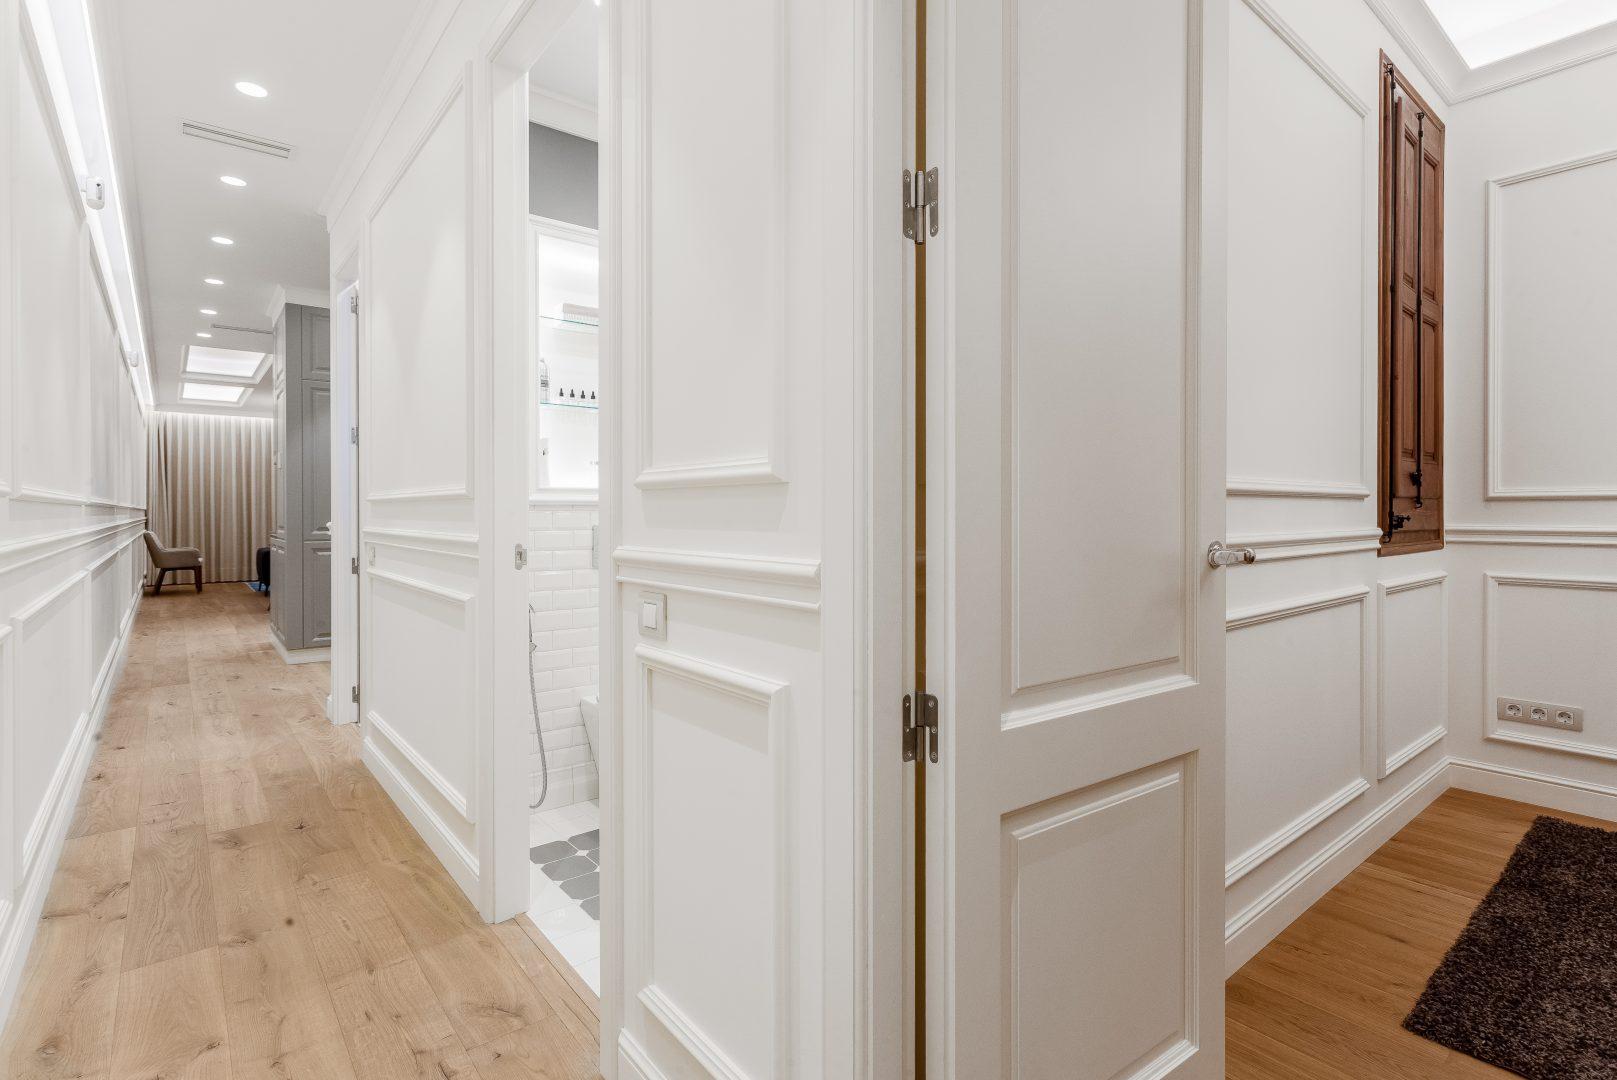 pasillo reforma de piso clásico